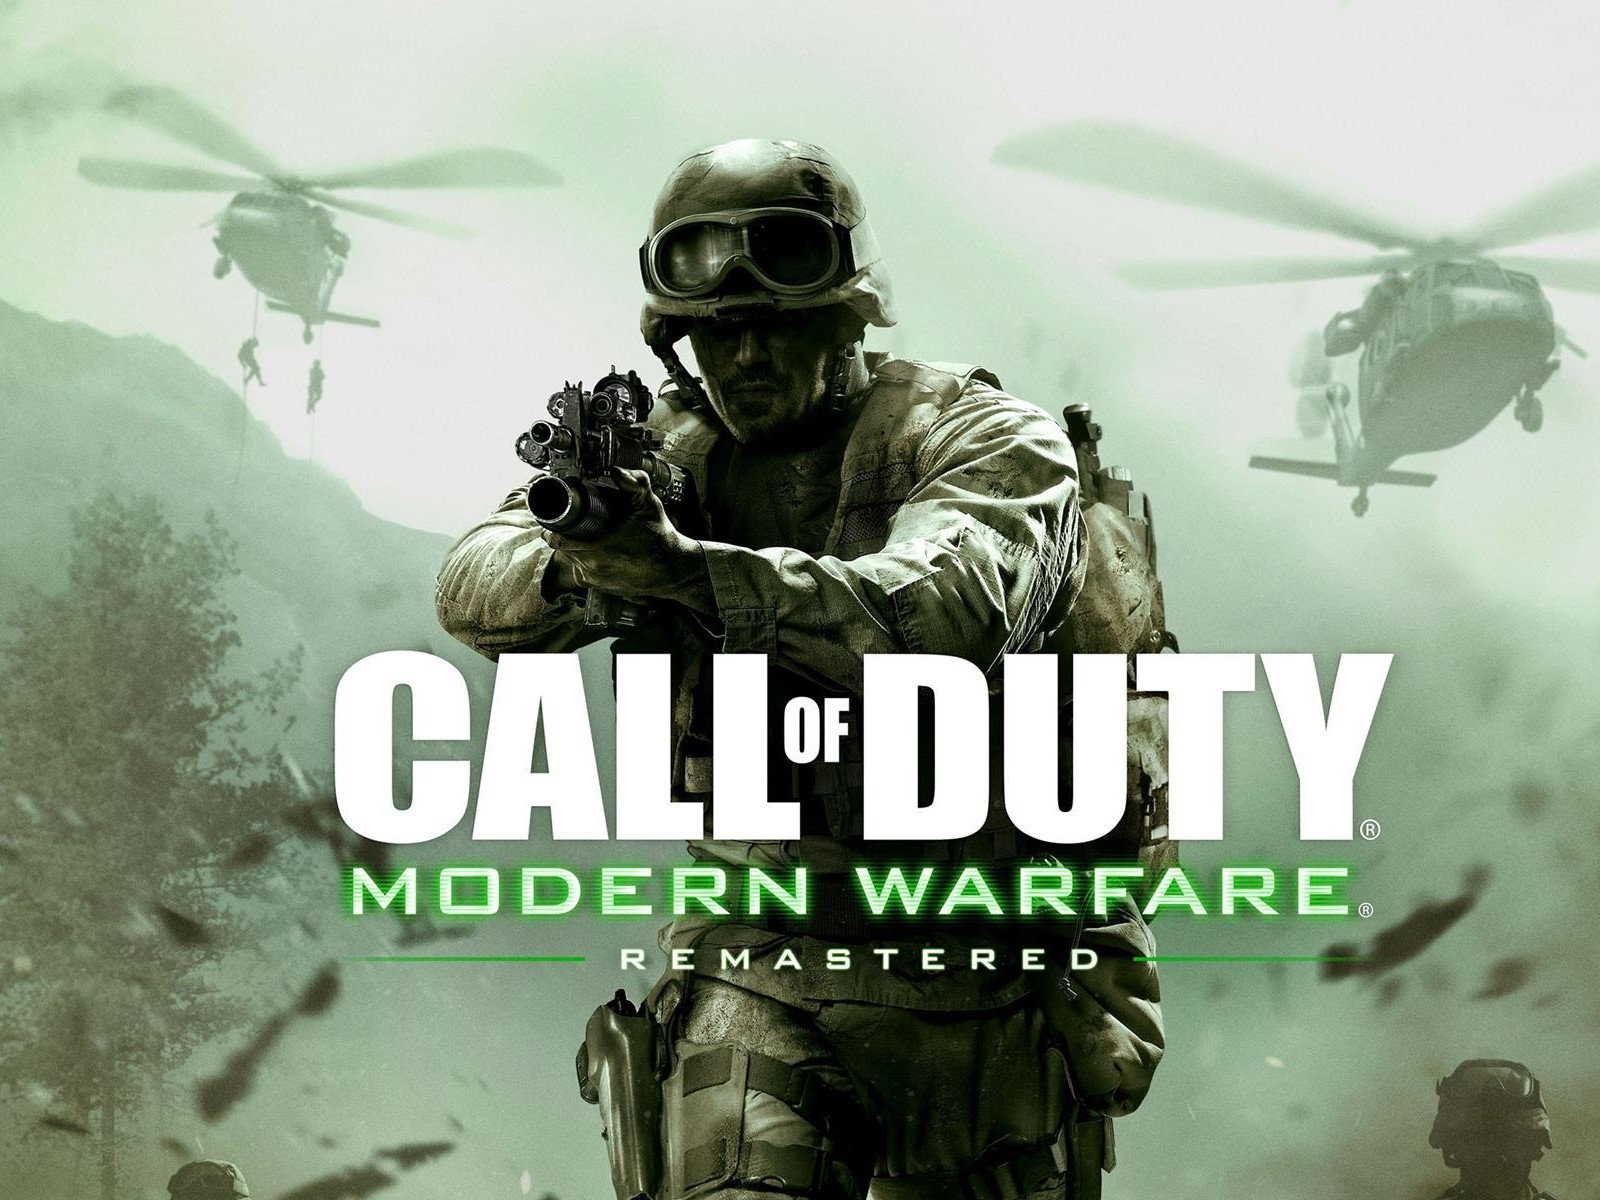 Call of Duty Modern Warfare RemasteredGame